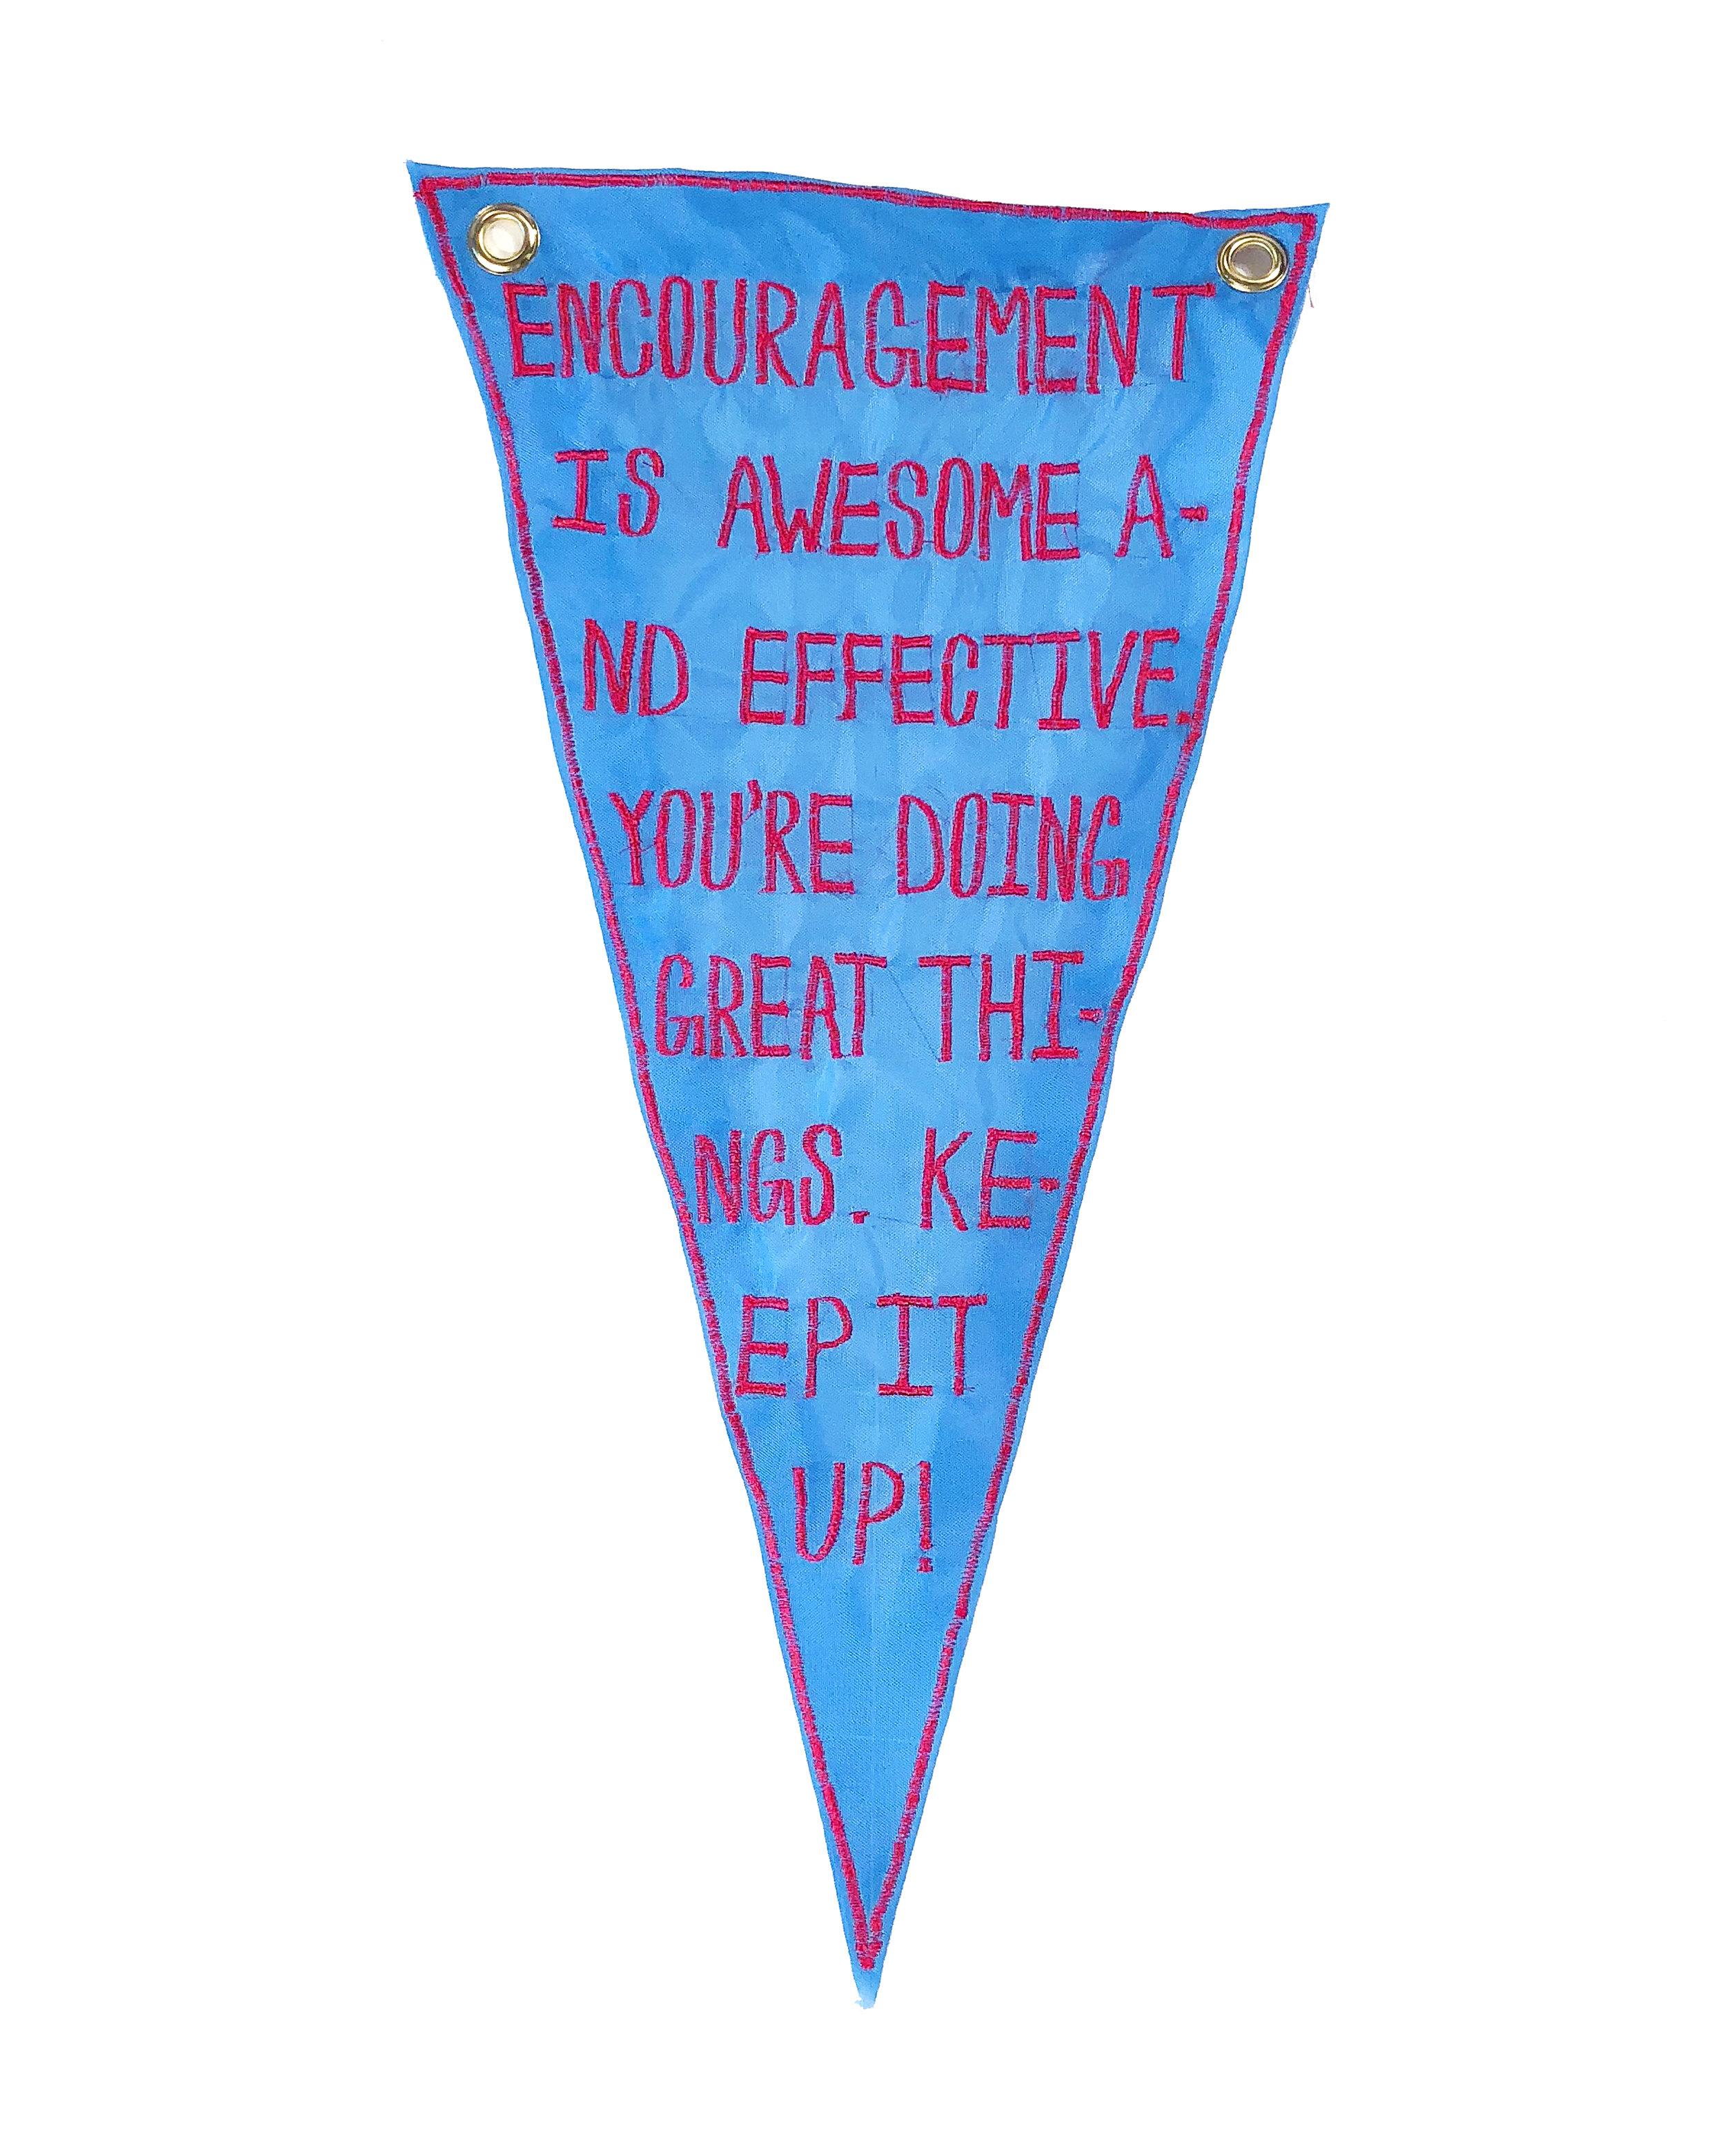 The Encouragement.jpg